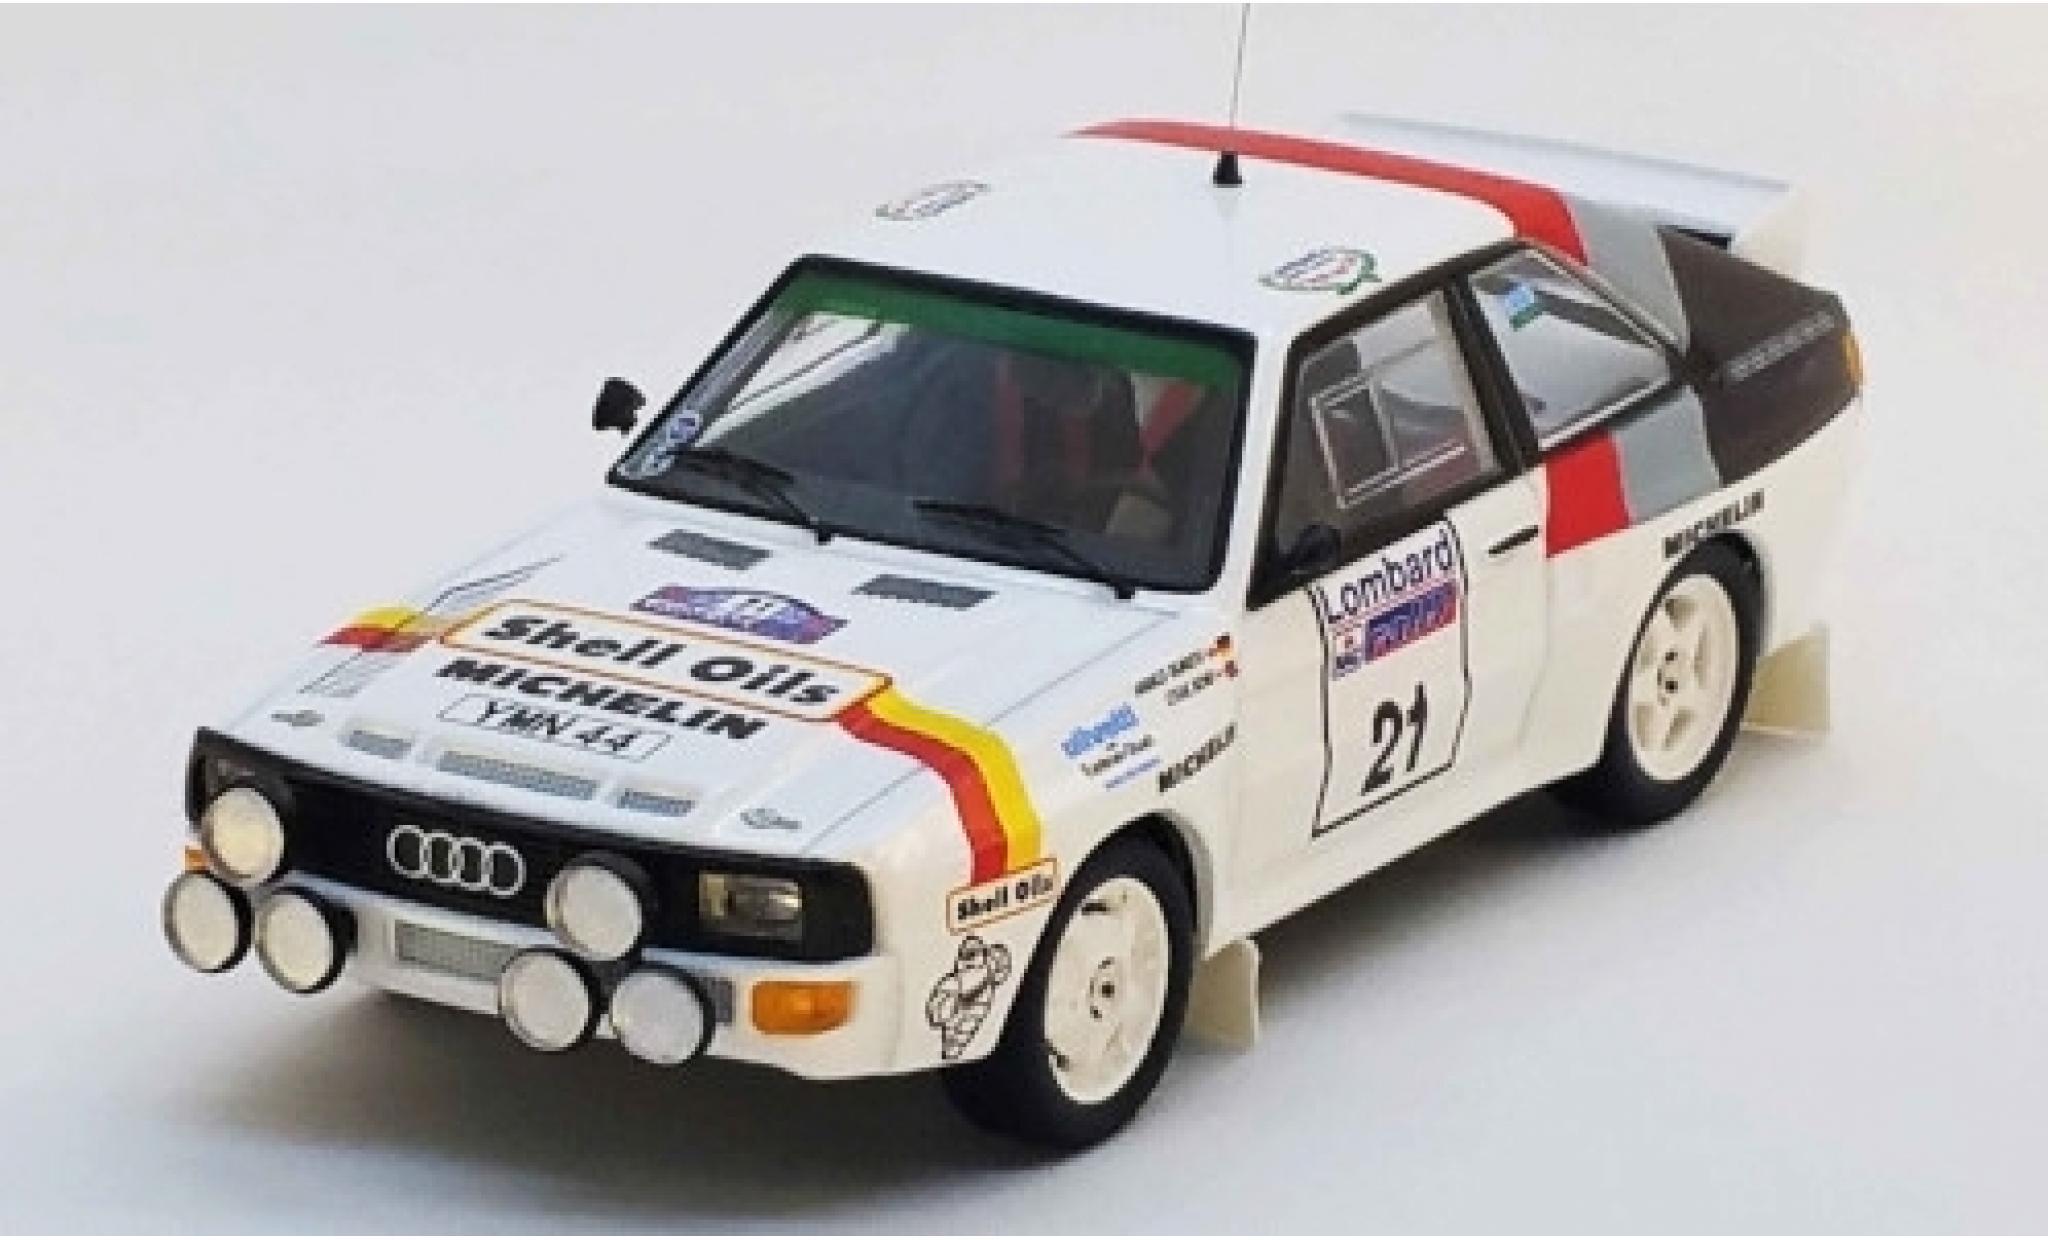 Audi Sport Quattro 1/43 Trofeu Sport quattro No.21 S Oils Rallye WM RAC Rallye 1986 H.Demuth/S.Bond